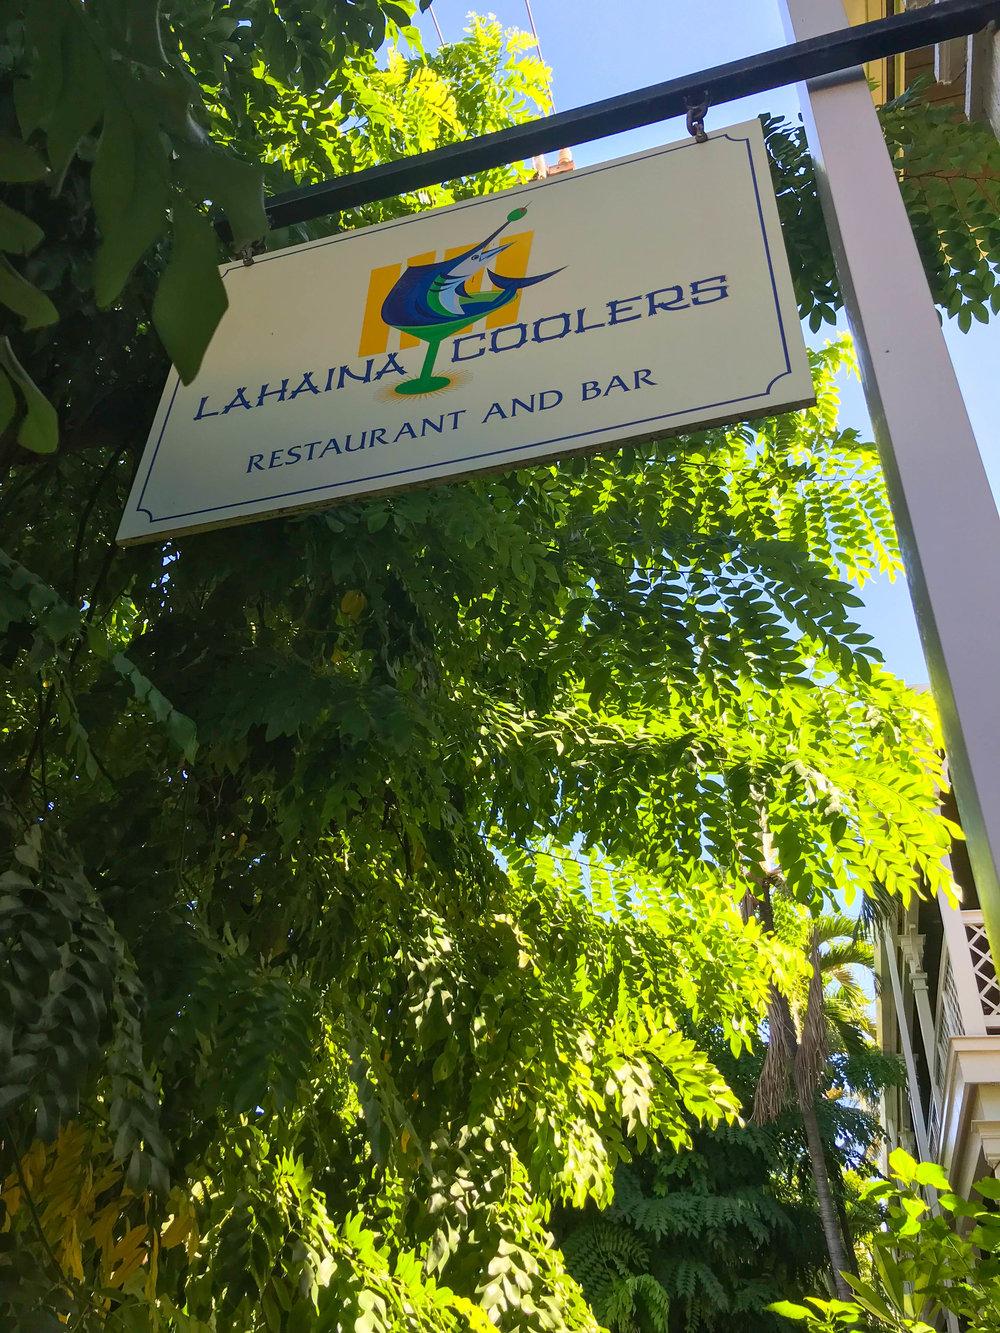 Lahaina Coolers - Maui, Hawaii - Breakfast